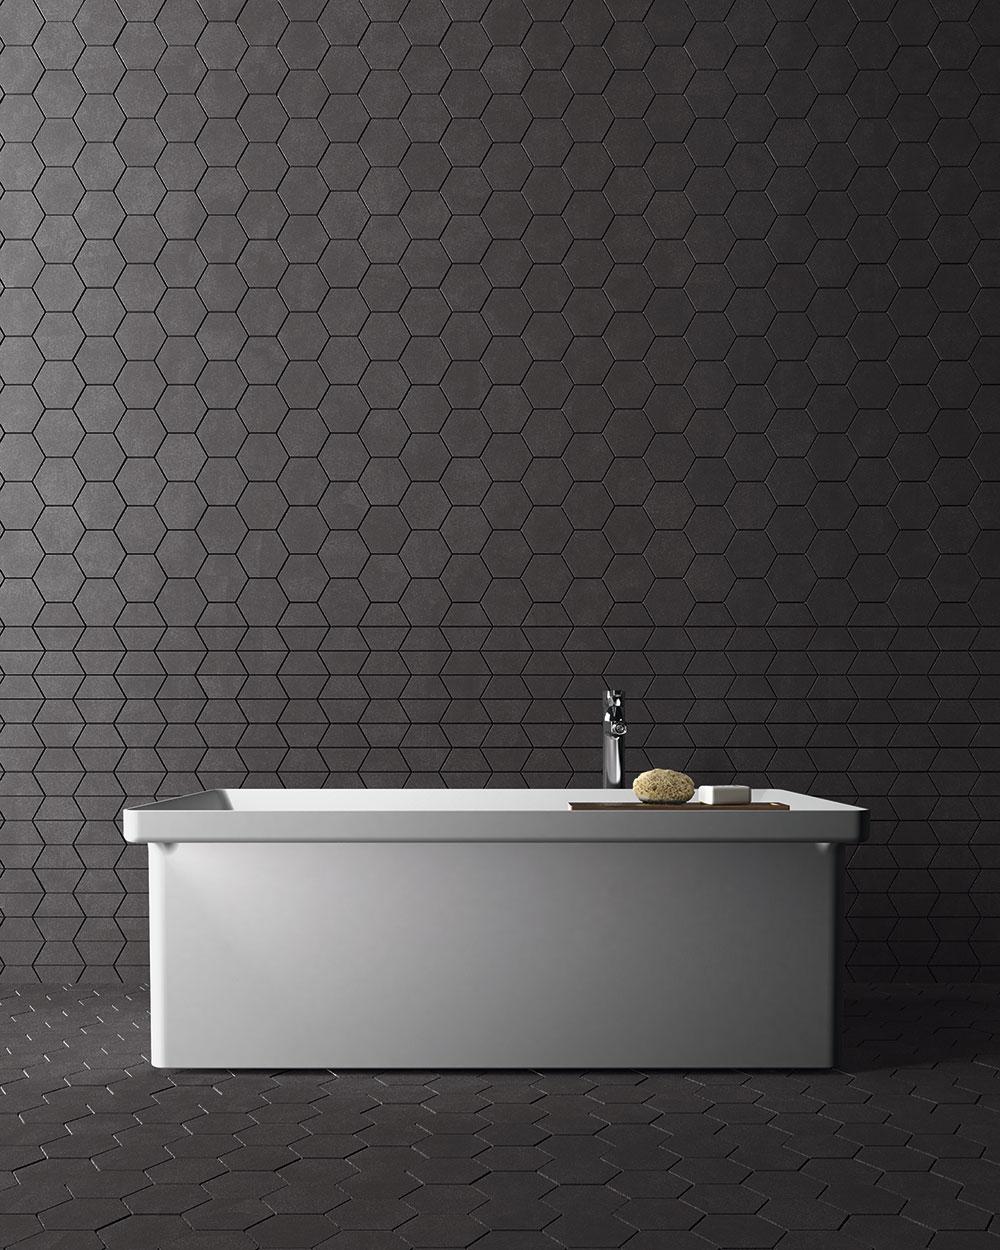 amb-living-ceramics-cava-black-01-hr